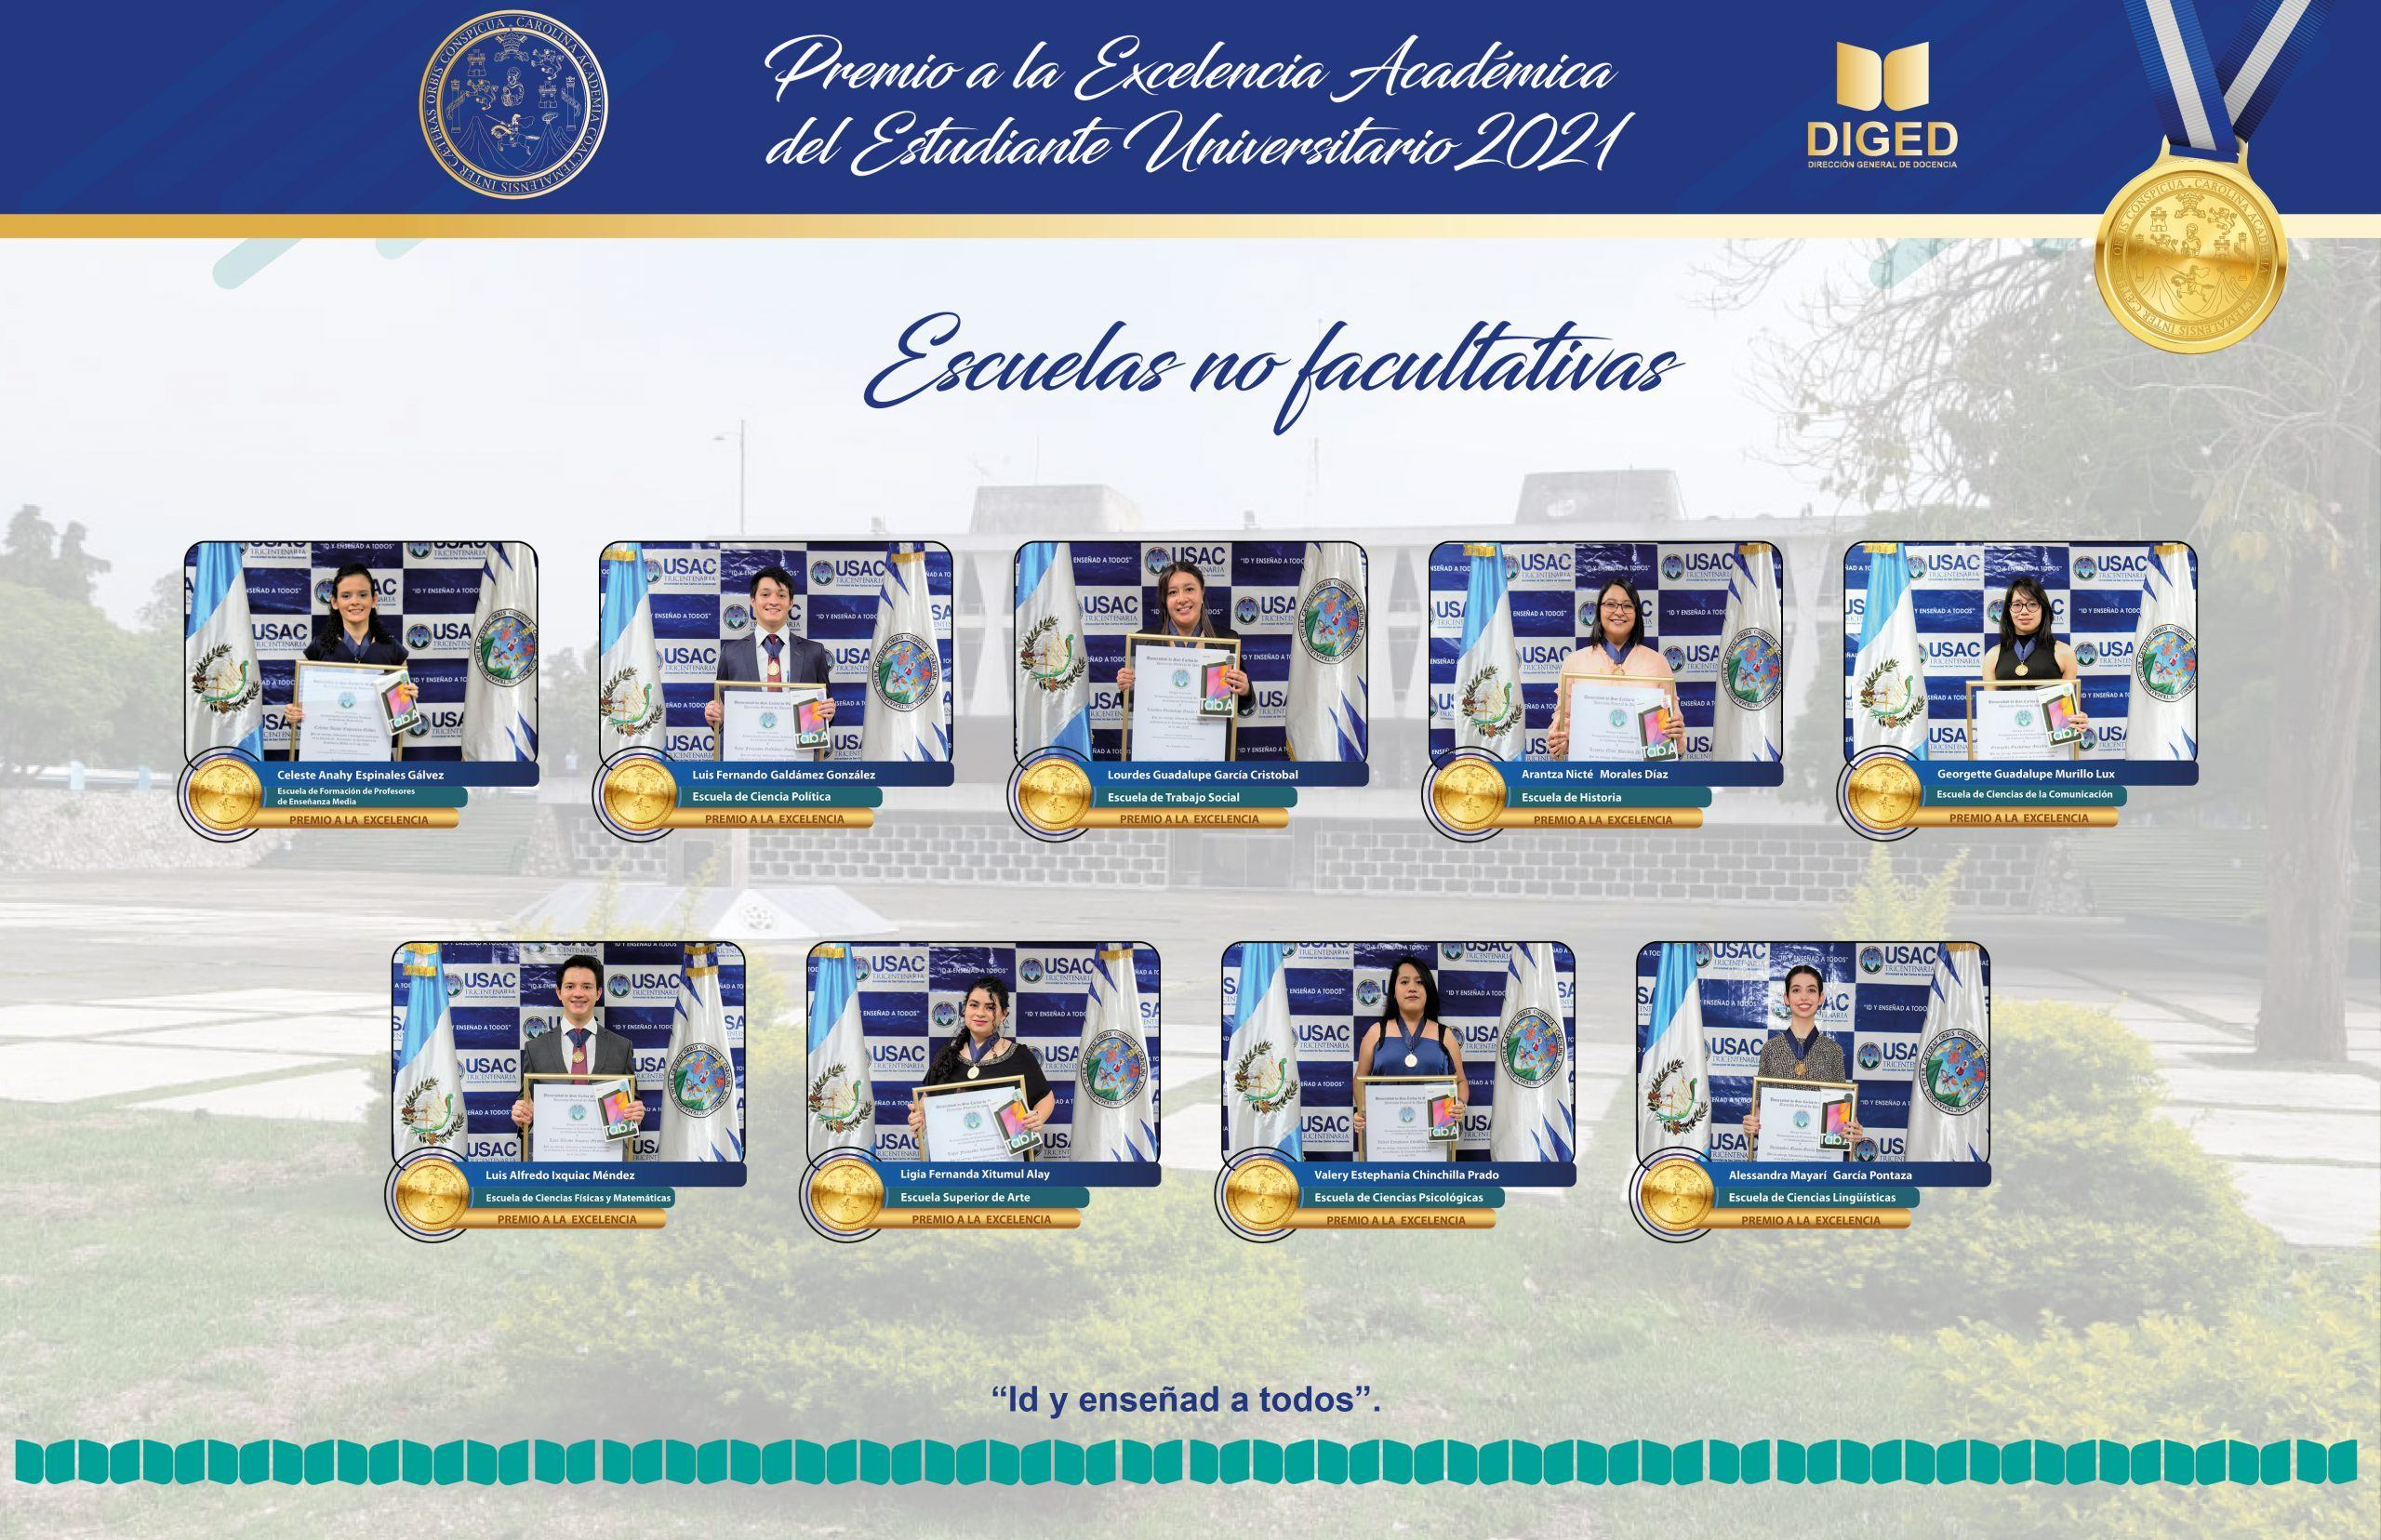 premio excelencia academica usac 2021 escuelas